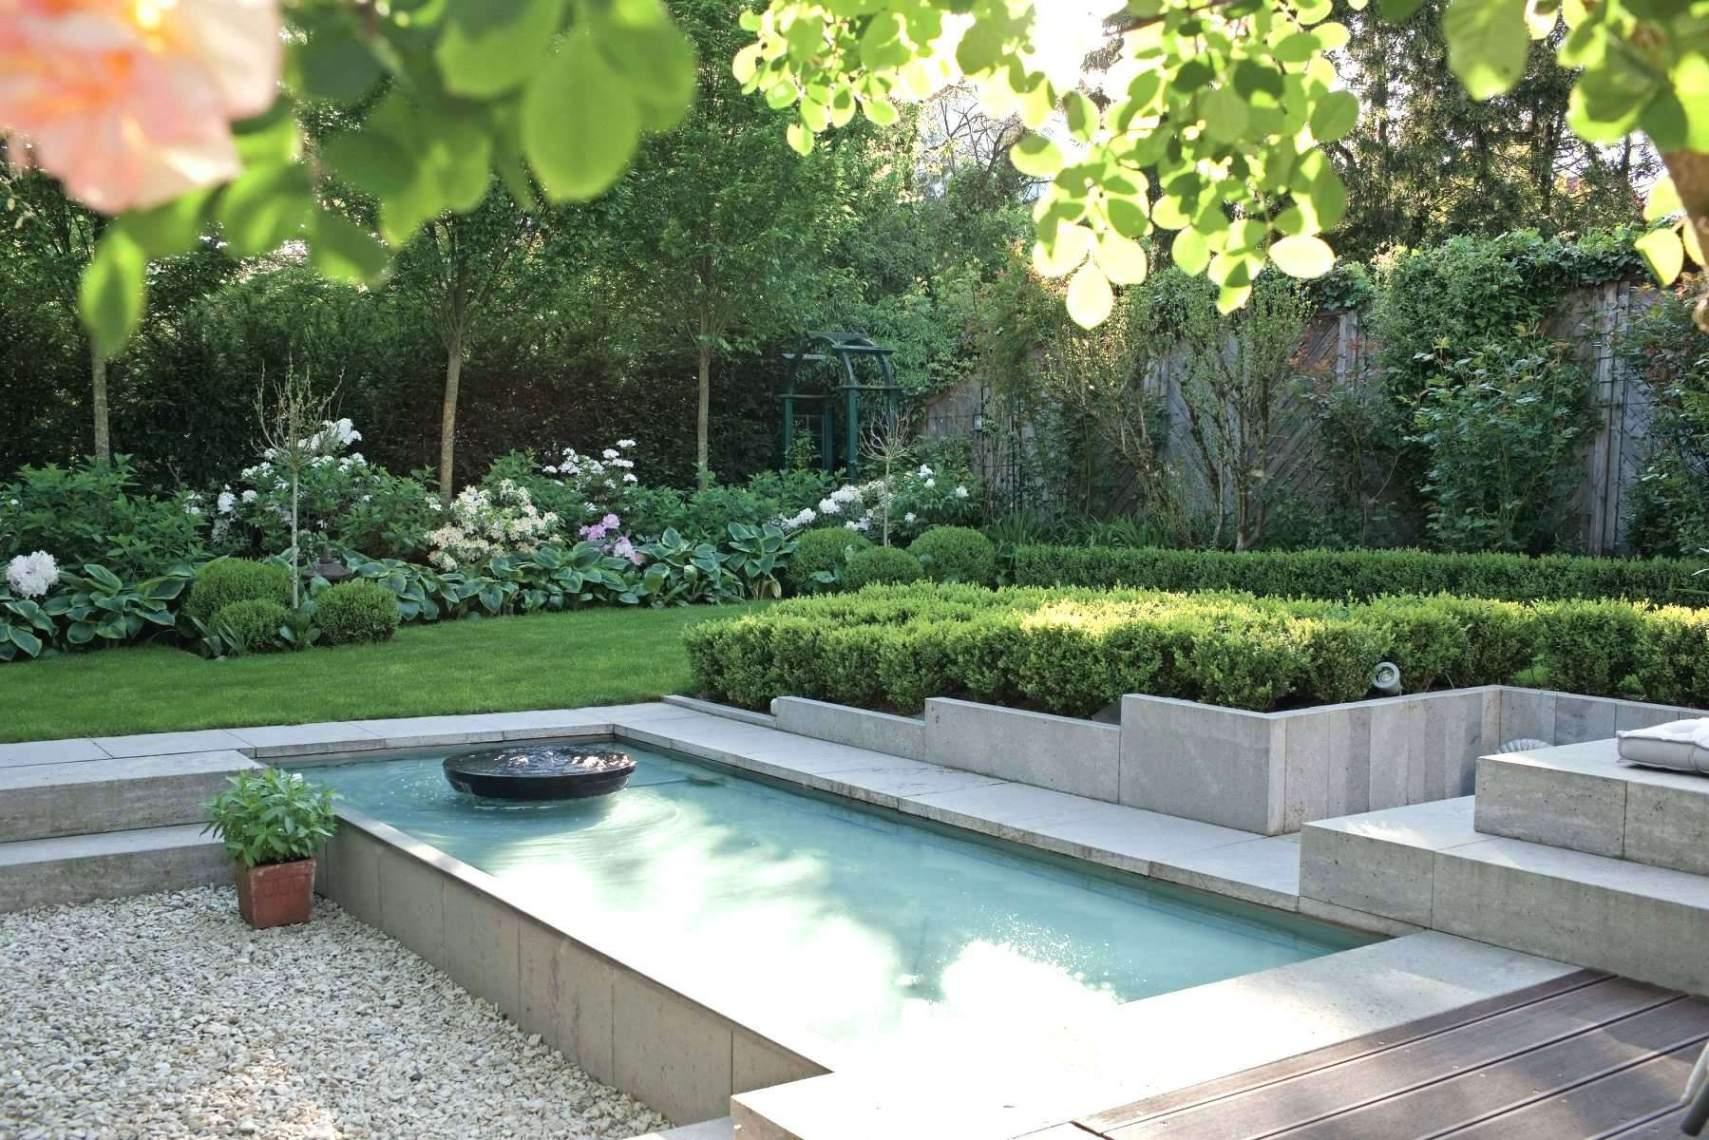 formaler reihenhausgarten 0d design ideen von garten gestalten ideen kleinen garten gestalten kleinen garten gestalten